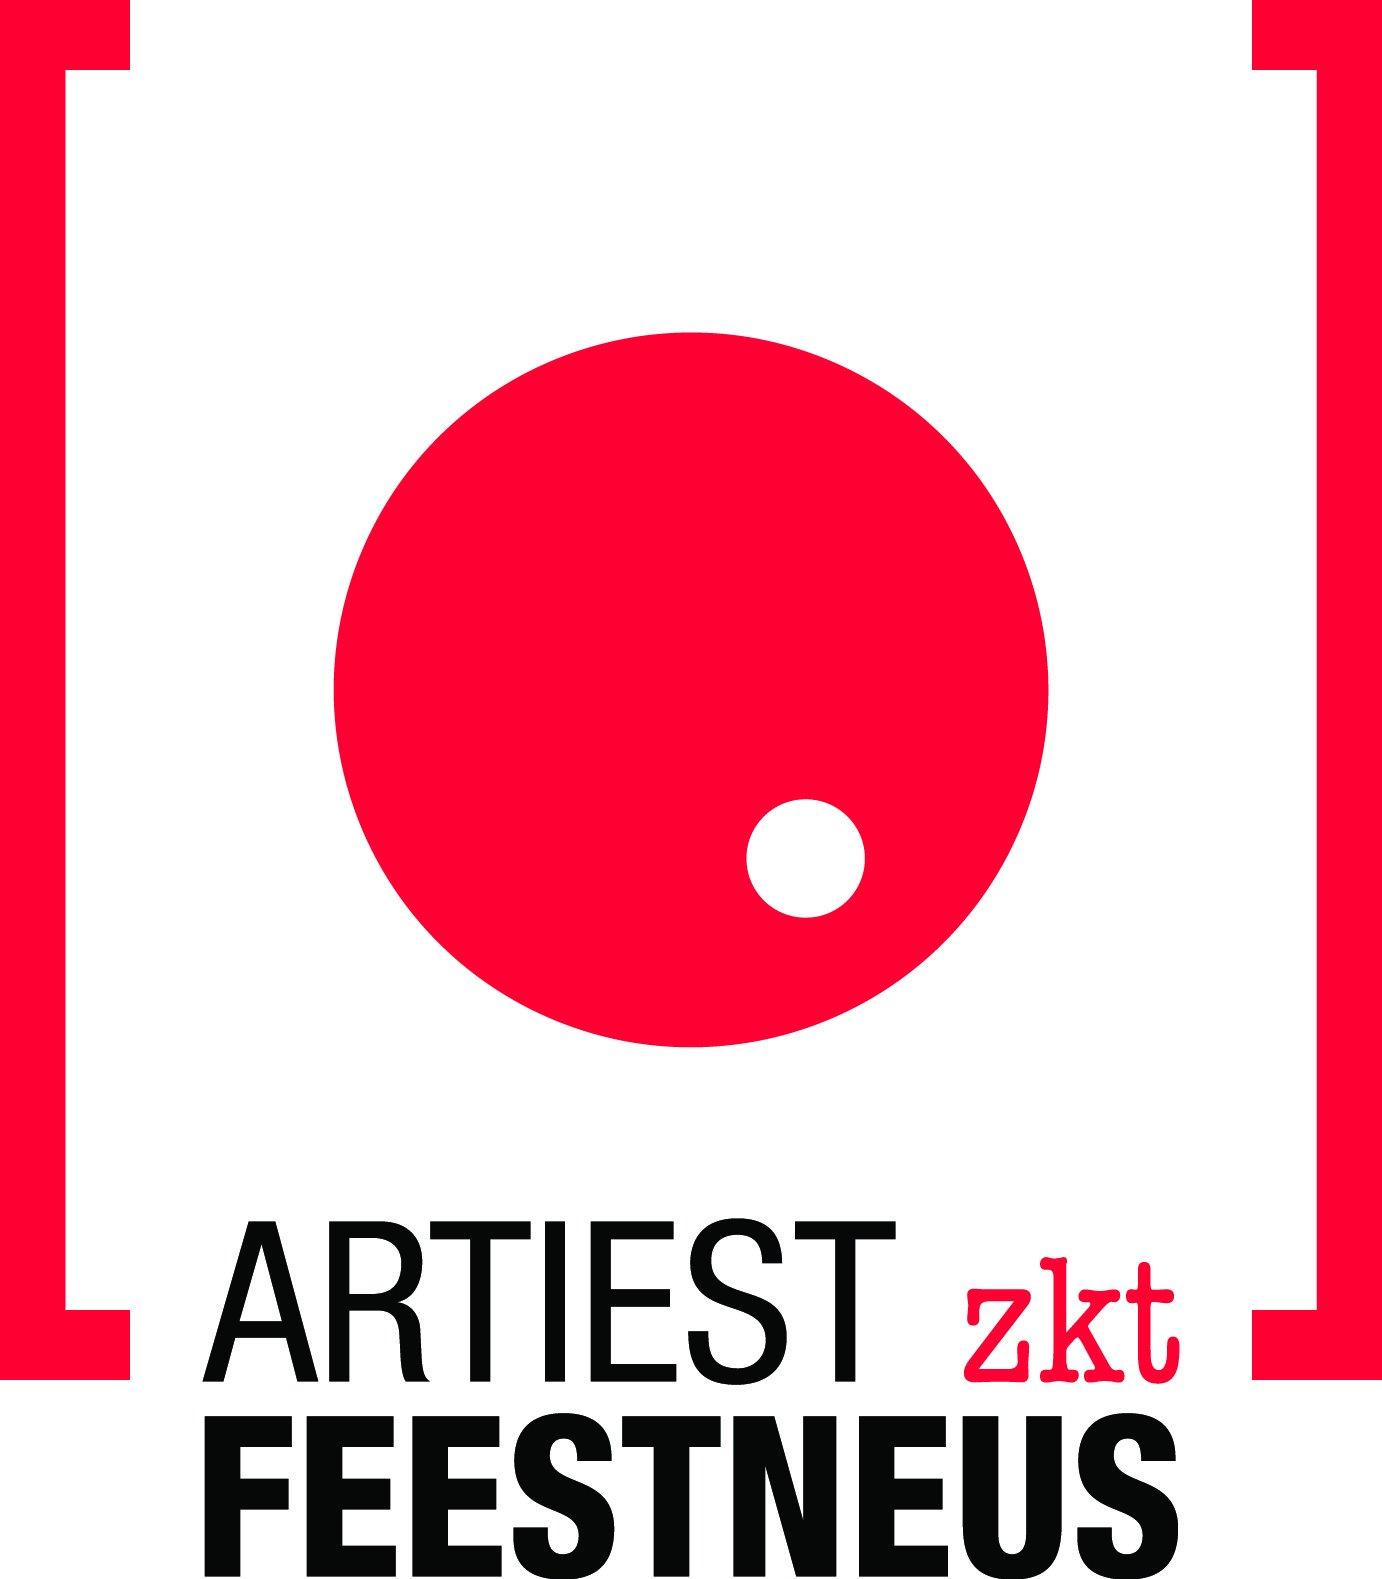 Logo feestneus